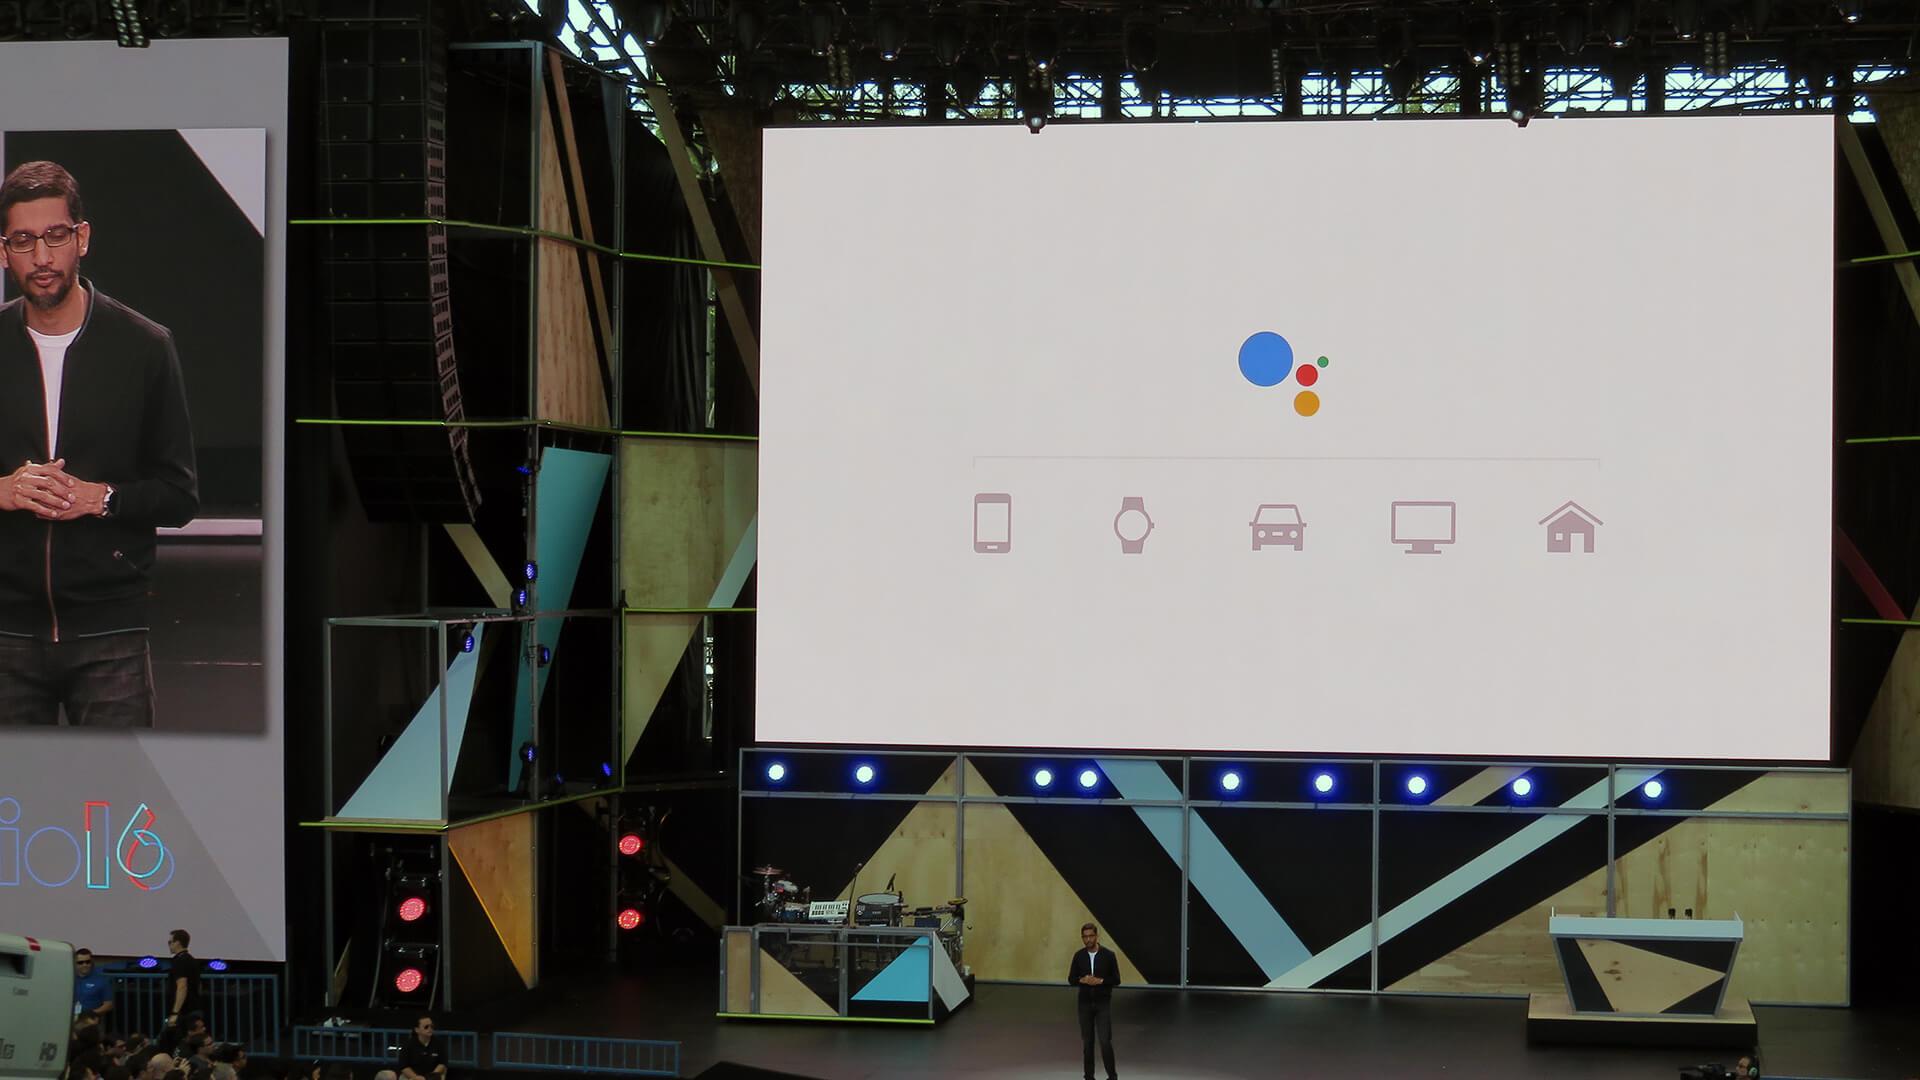 Google CEO Sundar Pichai presenting the Google Assistant on Tuesday.